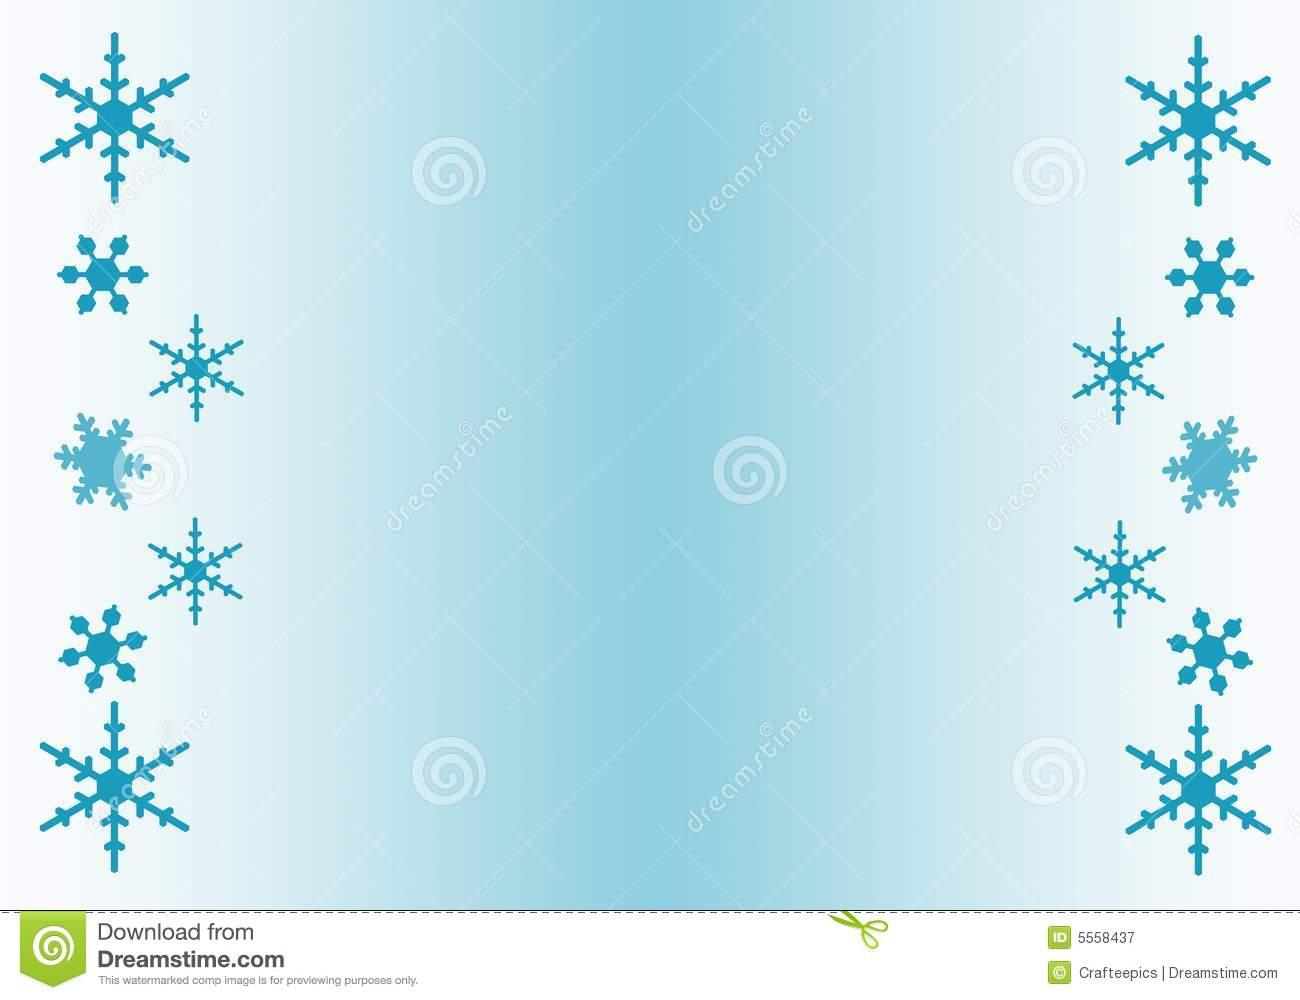 Snowflake Clipart Border .-Snowflake Clipart Border .-12